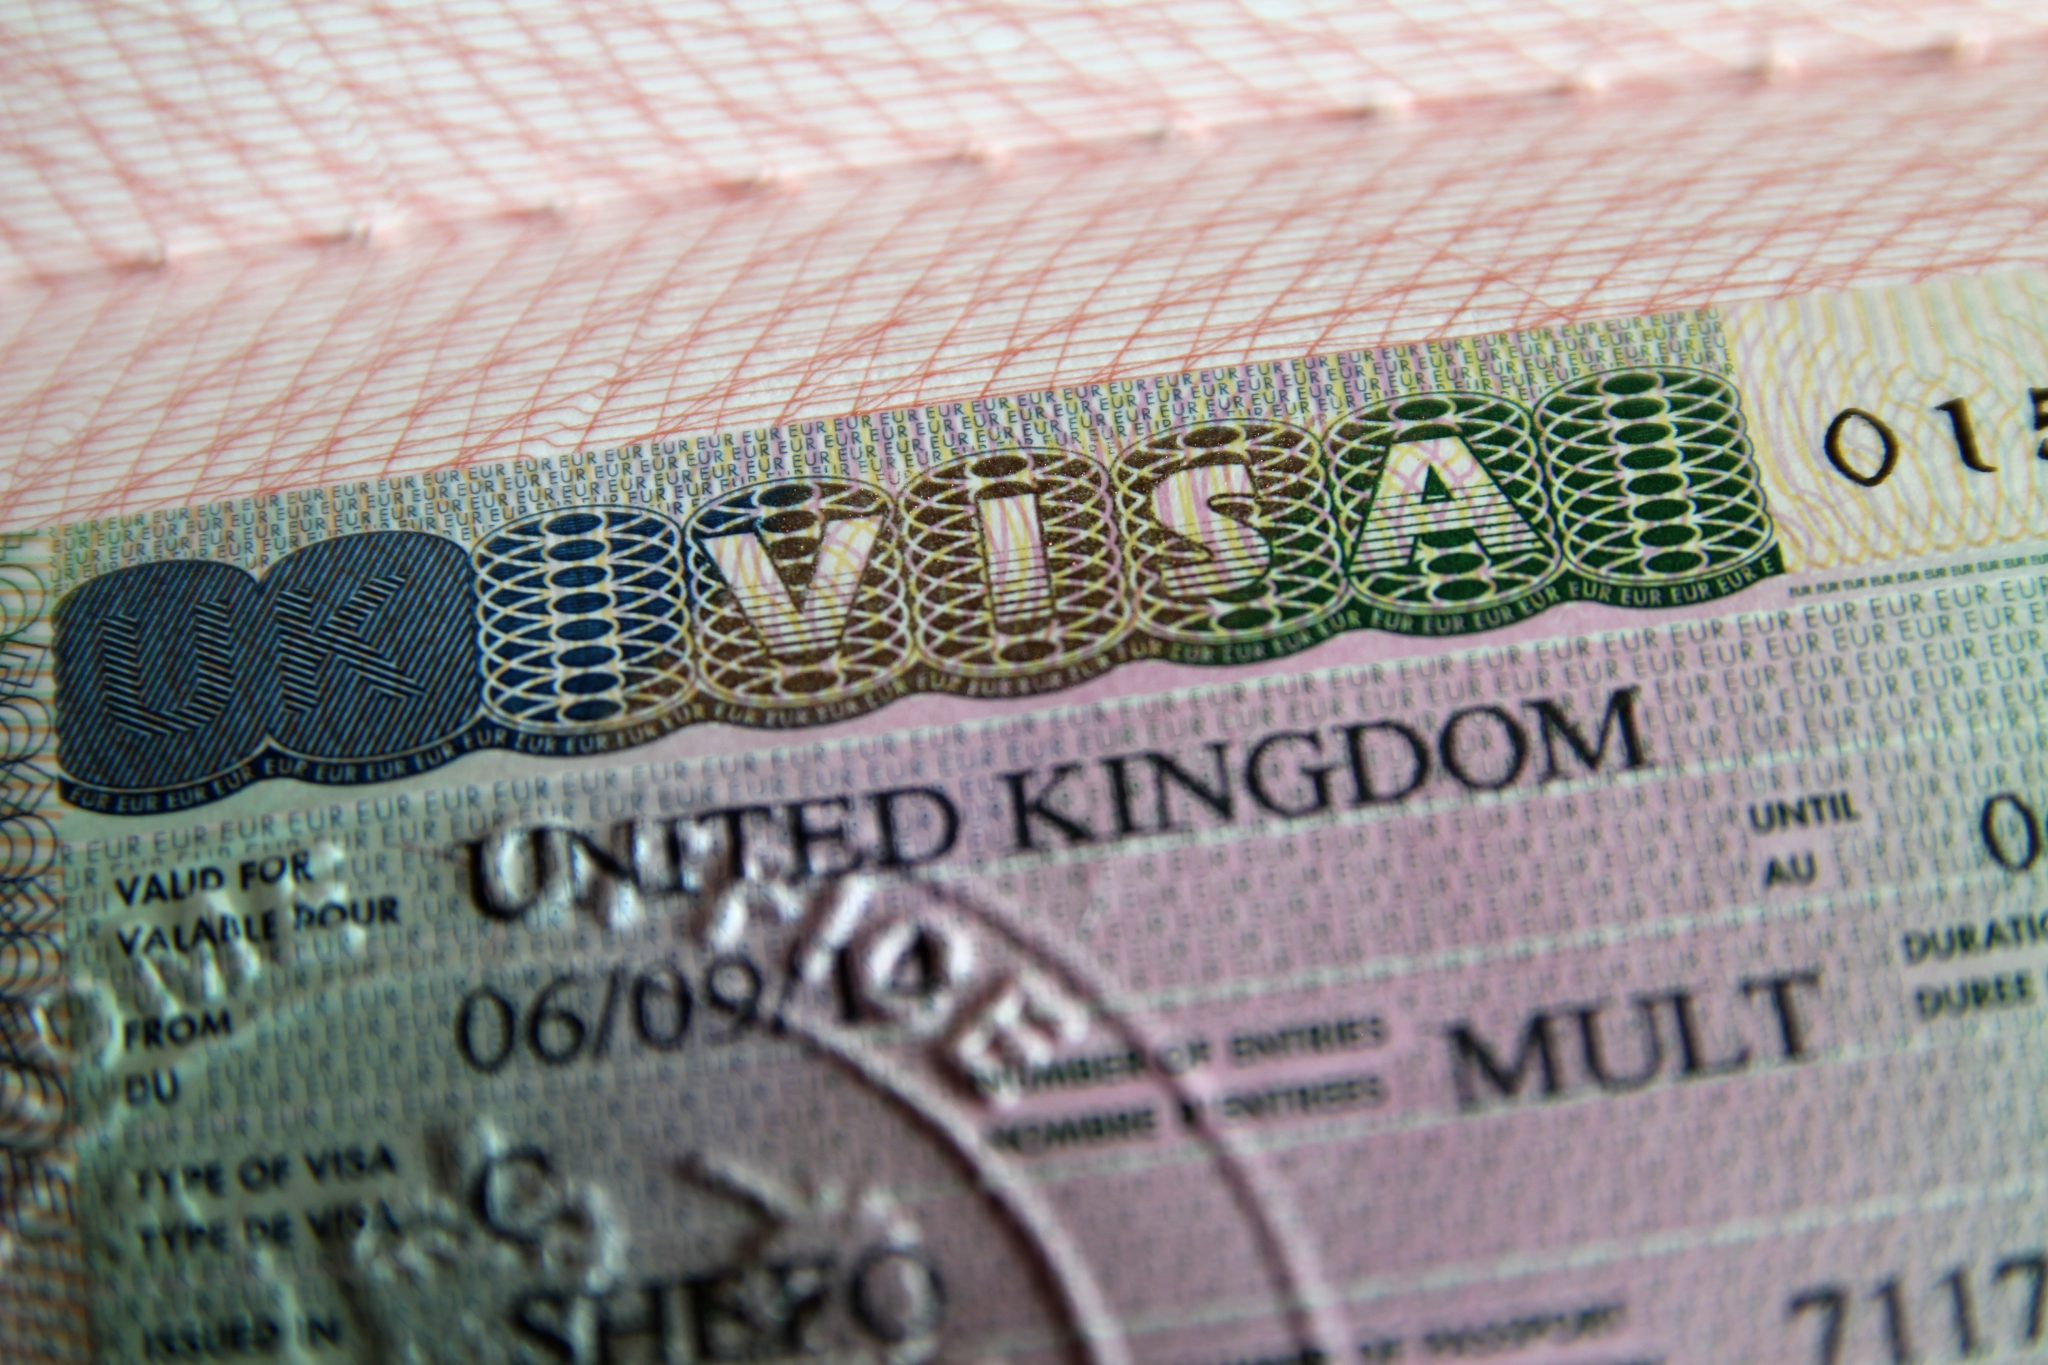 United Kingdom visa in passport